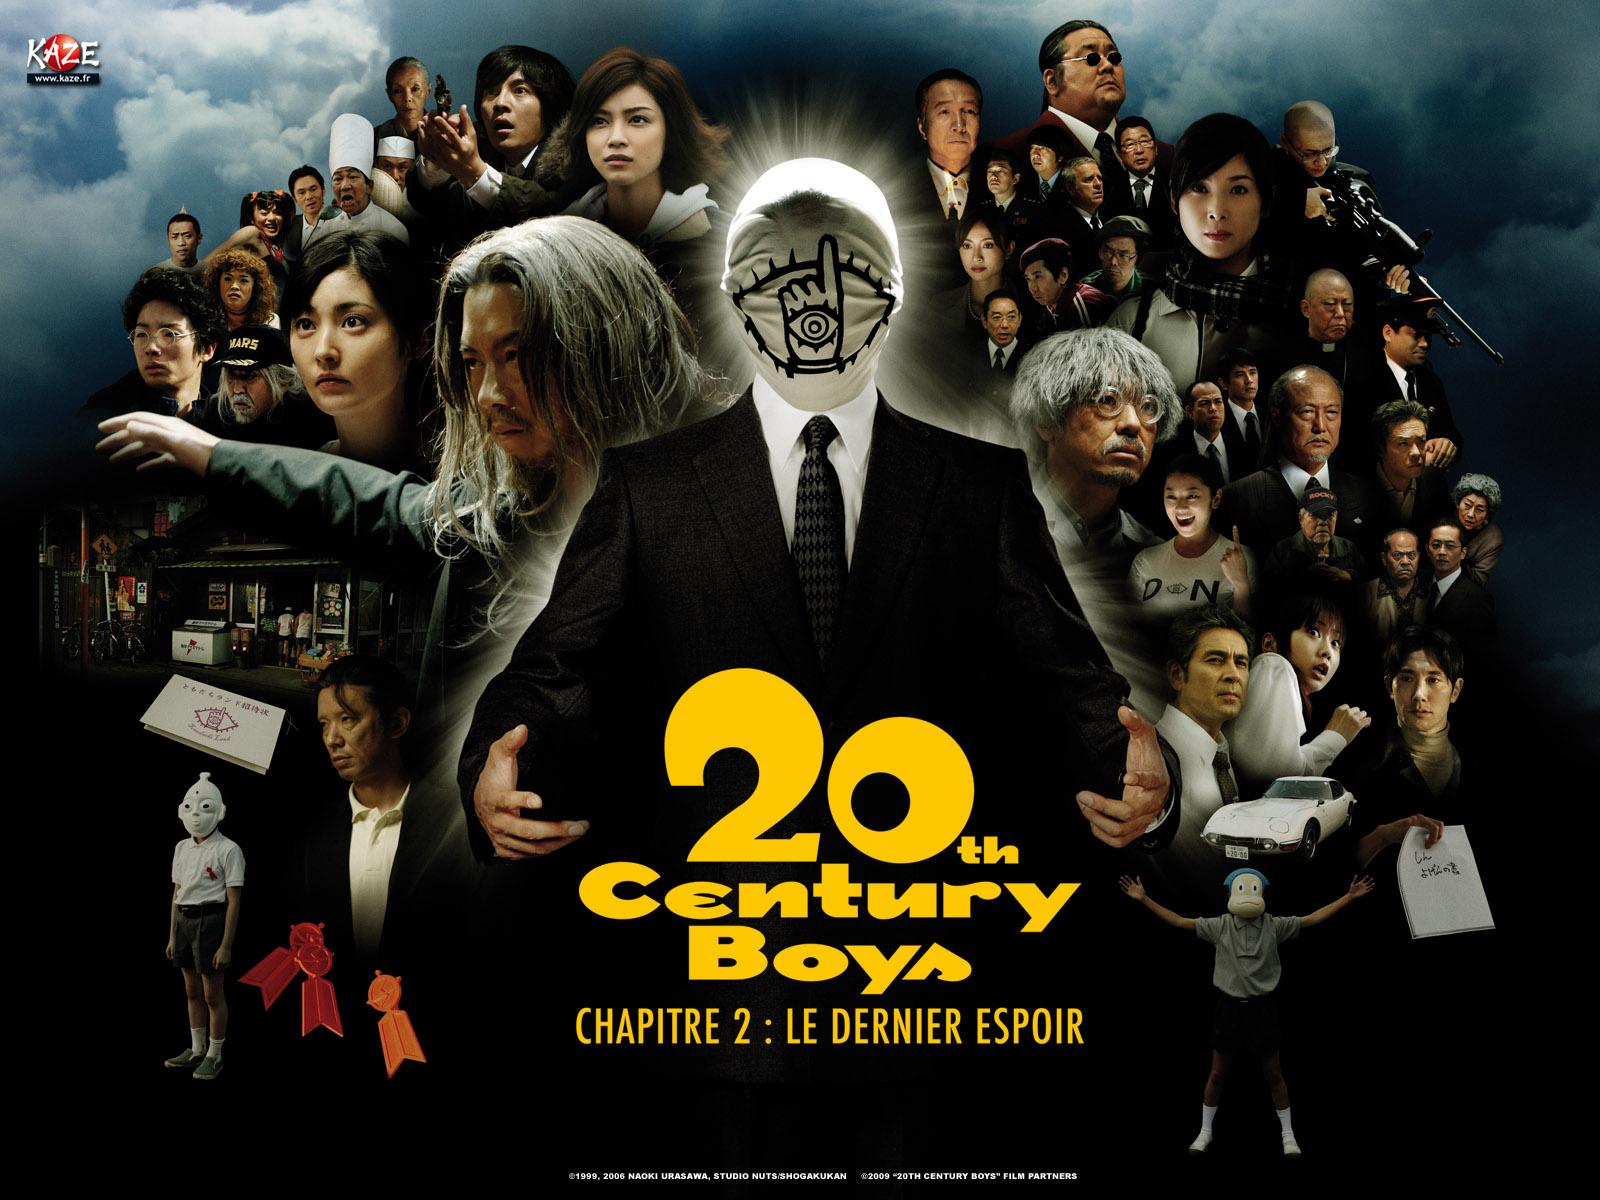 20th Century Boys Le Dernier Espoir épisode 2 Wallpaper De 20th